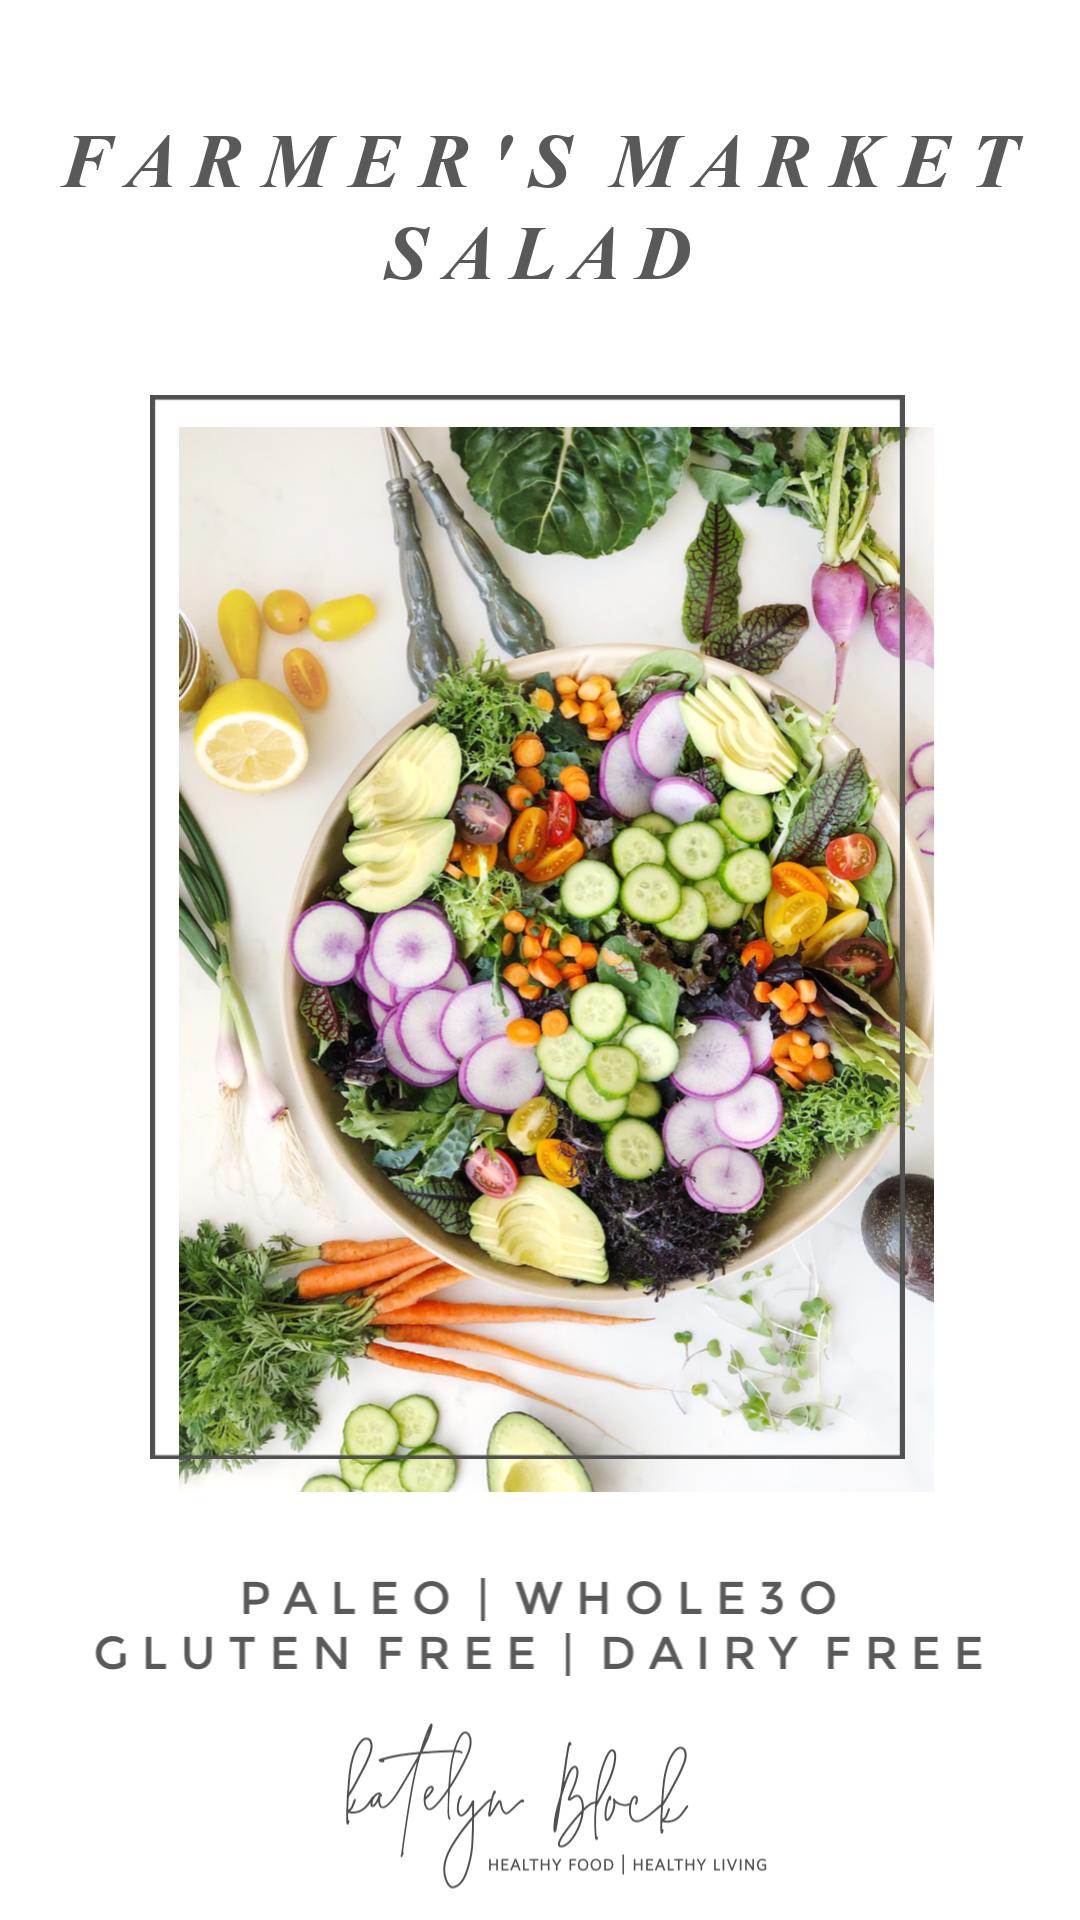 Farmers Market Salad whole30 Paleo Whole30.png